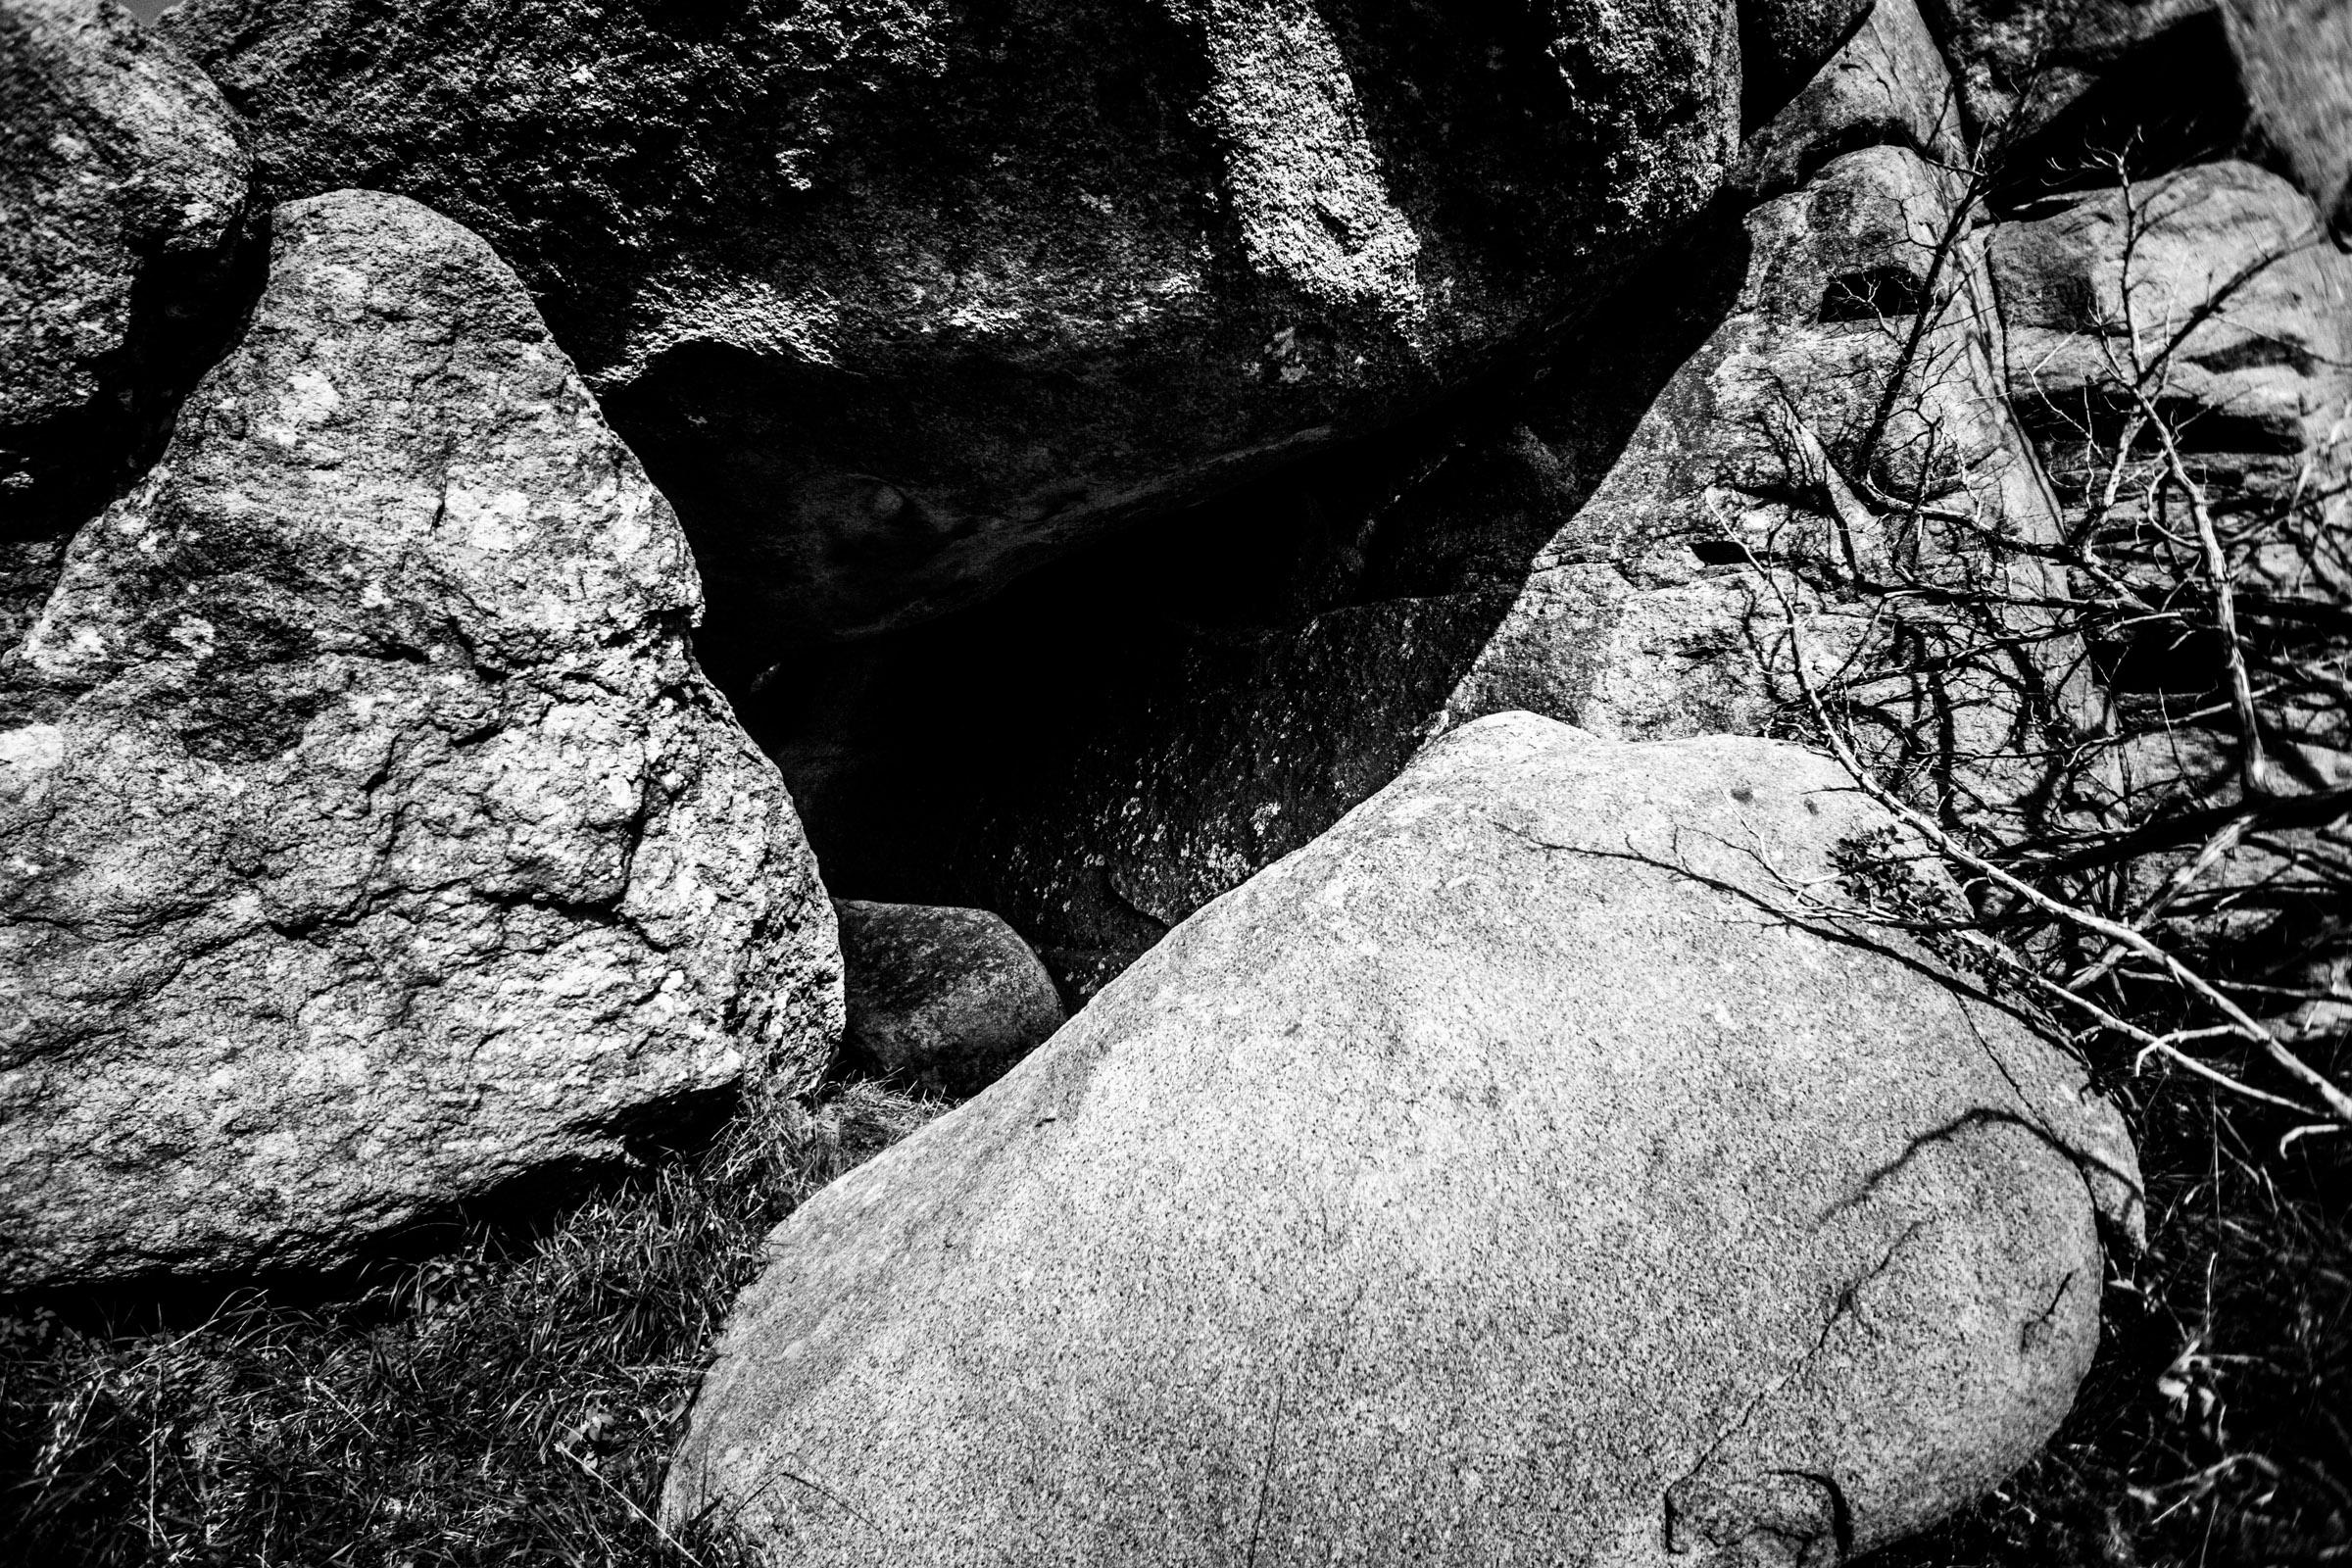 Mount Mitchell B&W 08-07-16 (24 of 35).jpg